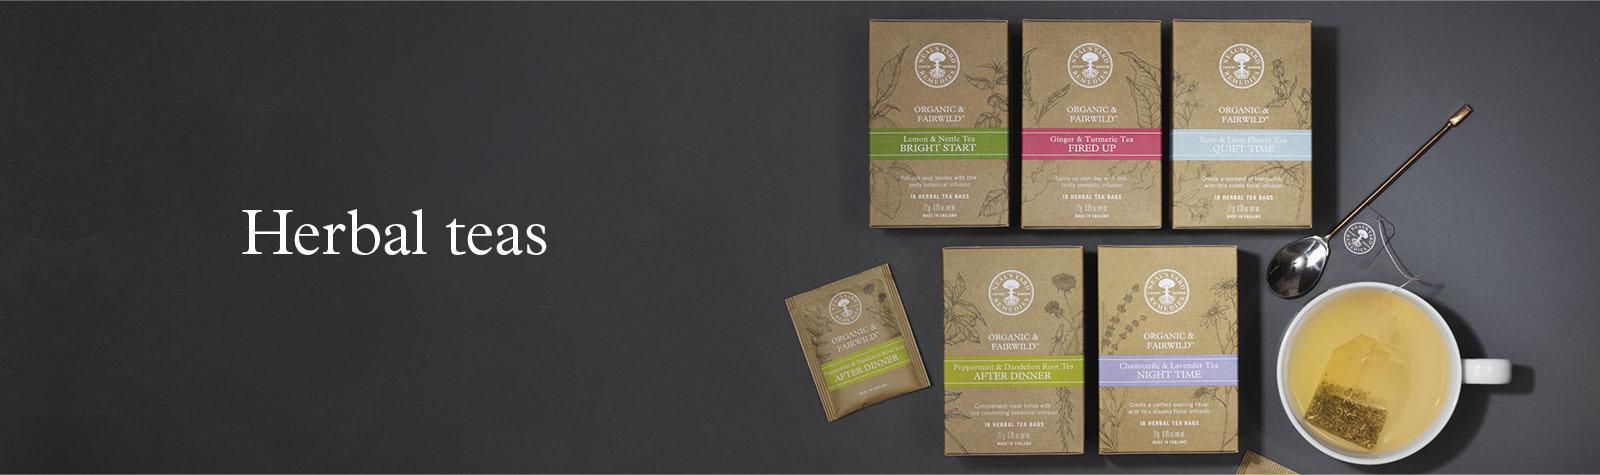 natural-health-herbal-teas-ws.jpg